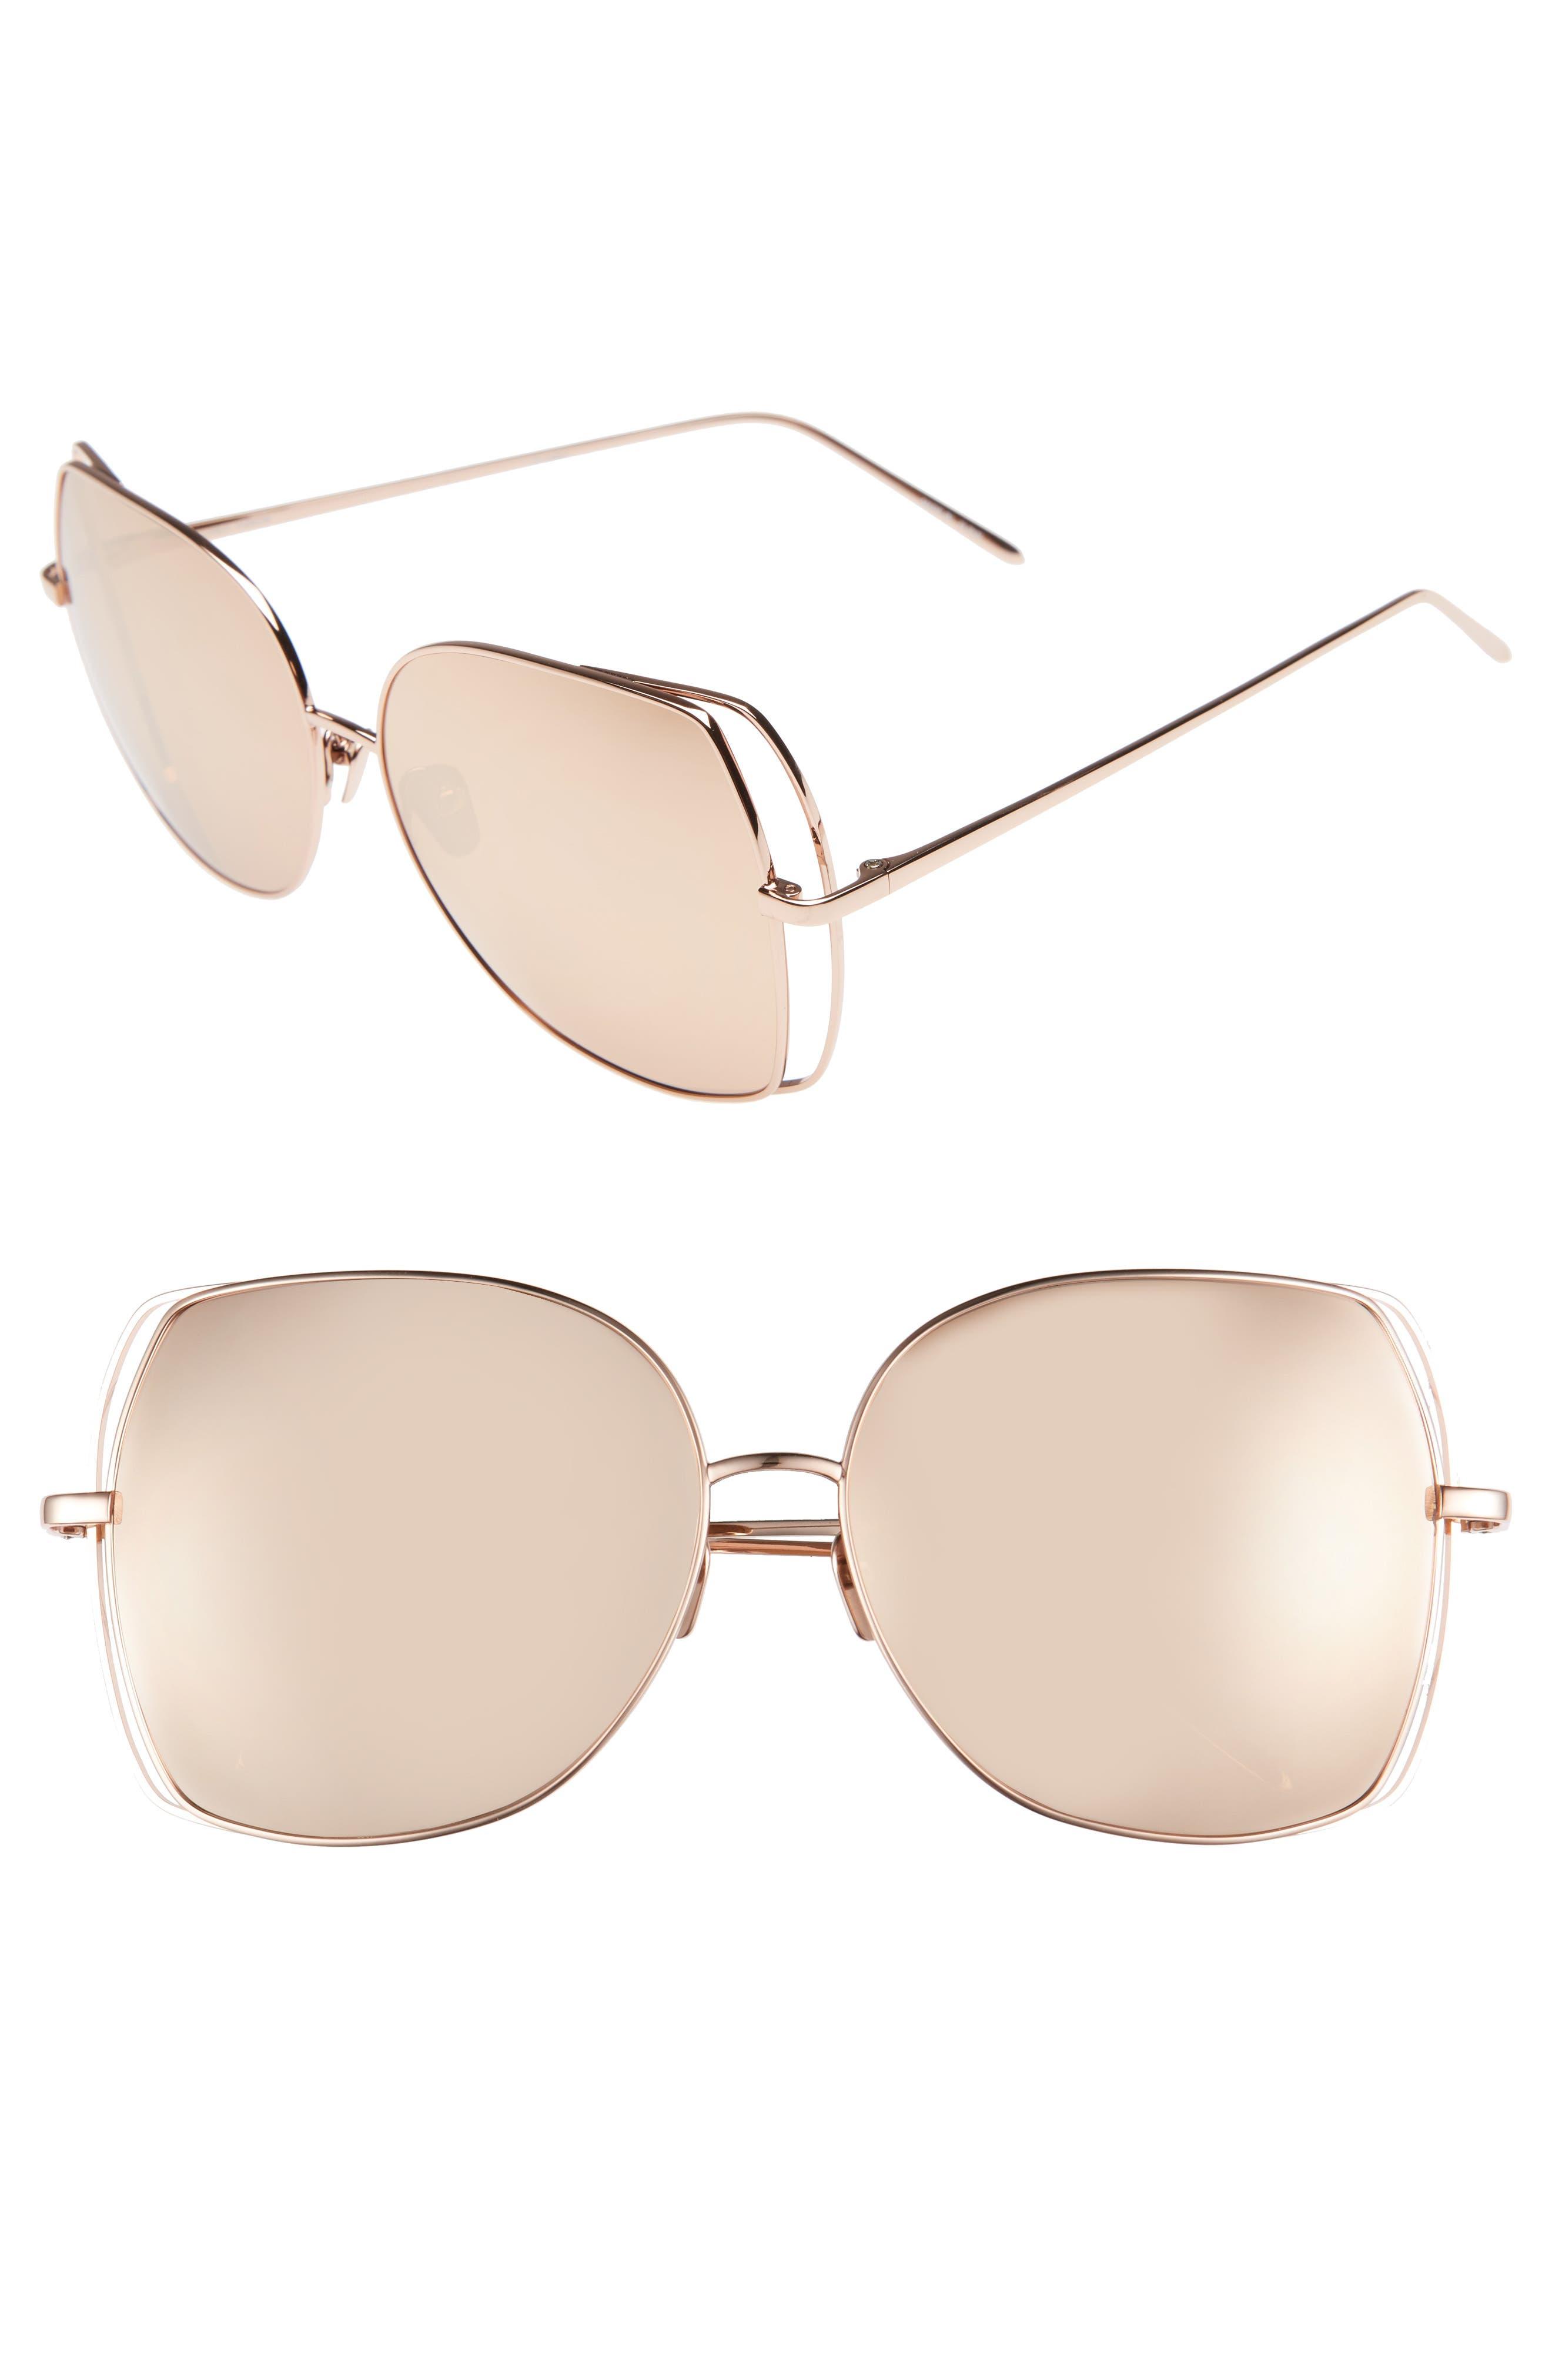 Linda Farrow 61mm Mirrored 18 Karat Rose-Gold Sunglasses